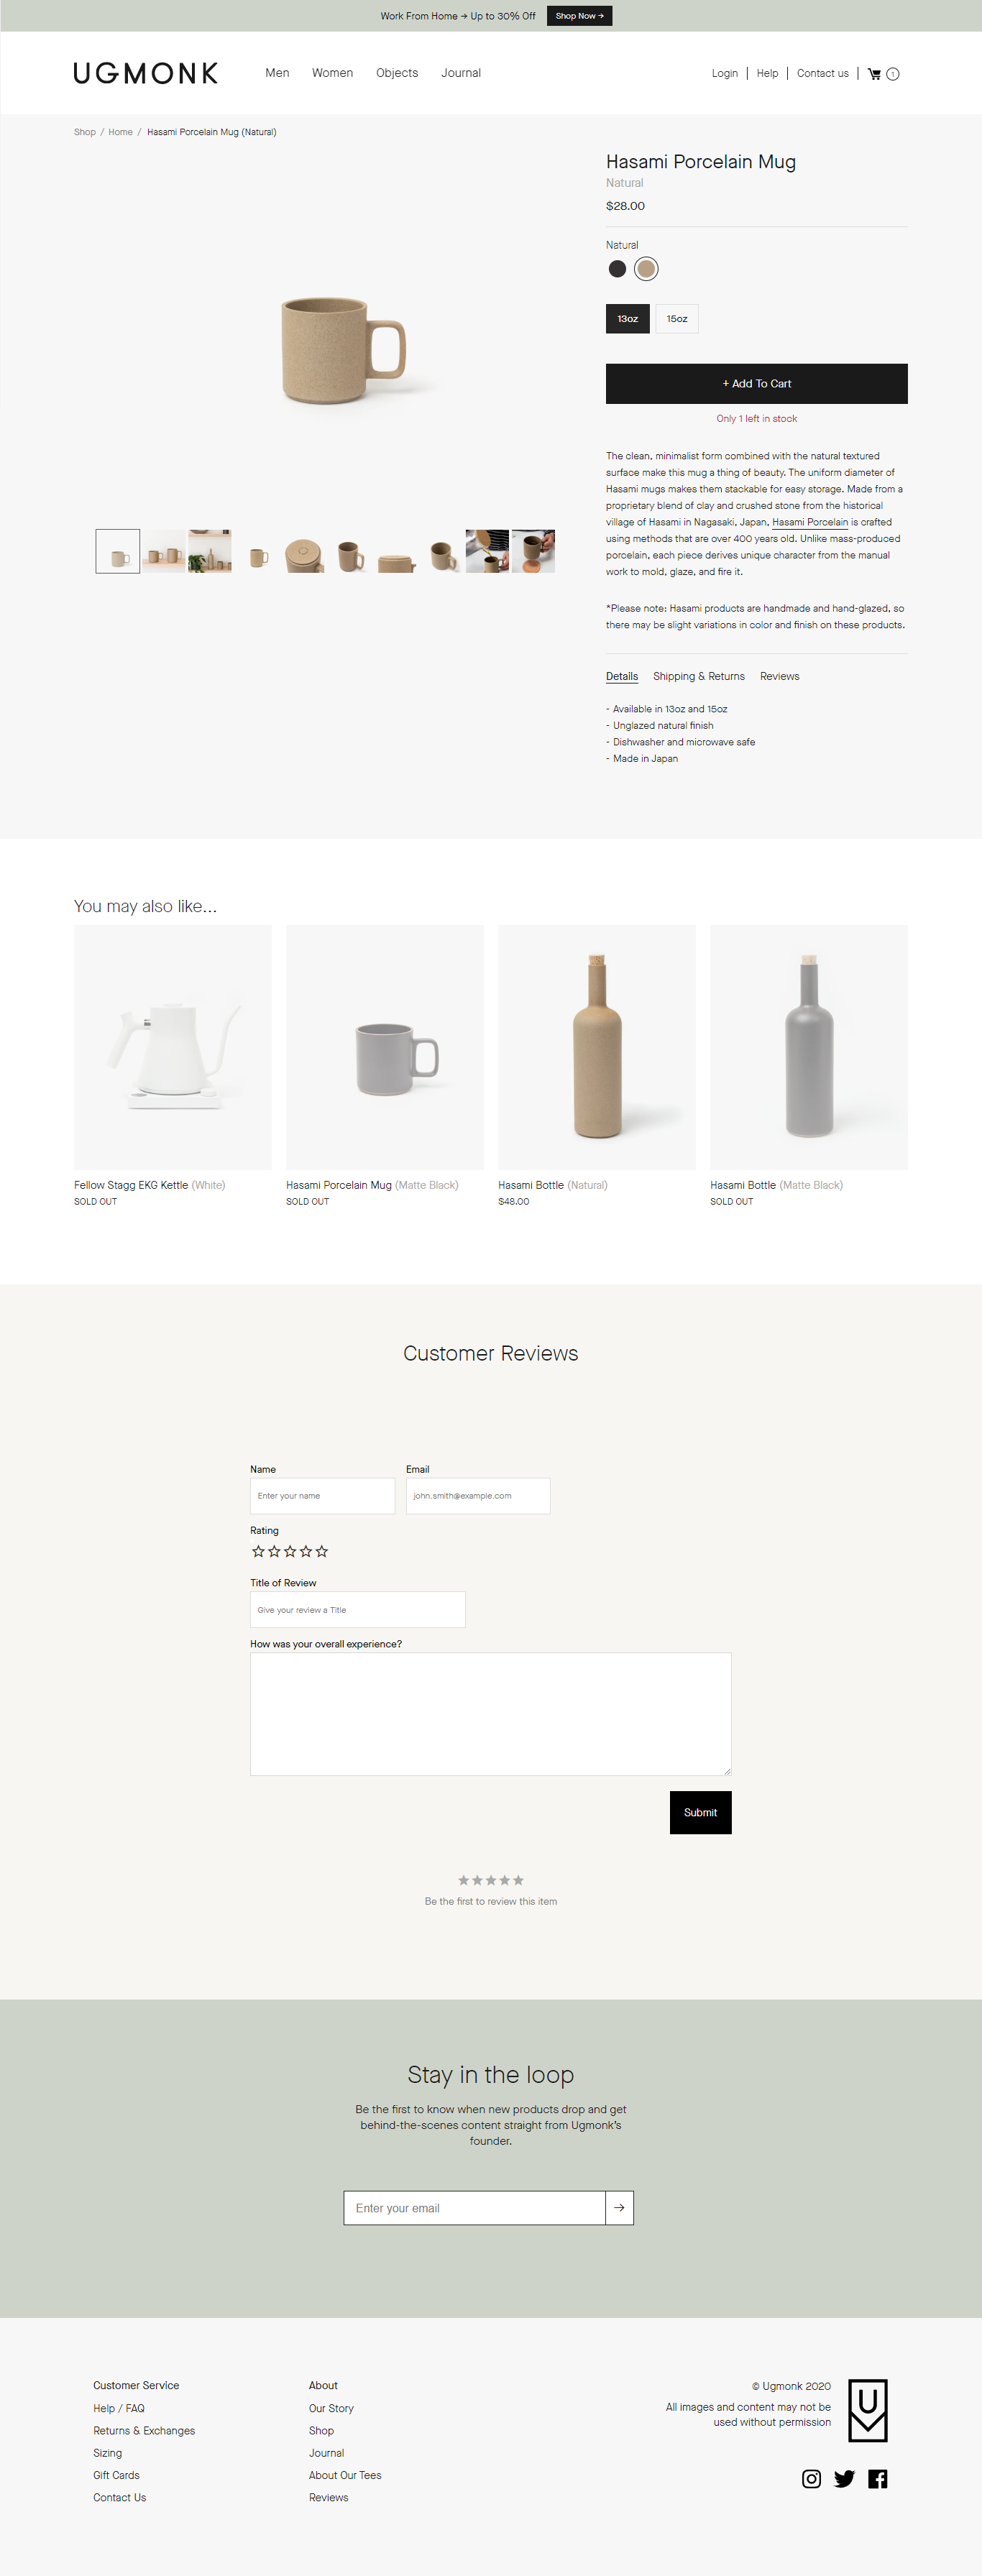 Brilliant Minimalistic Product Page Design Example In 2020 Minimalist Web Design Modern Web Design Web Design Websites